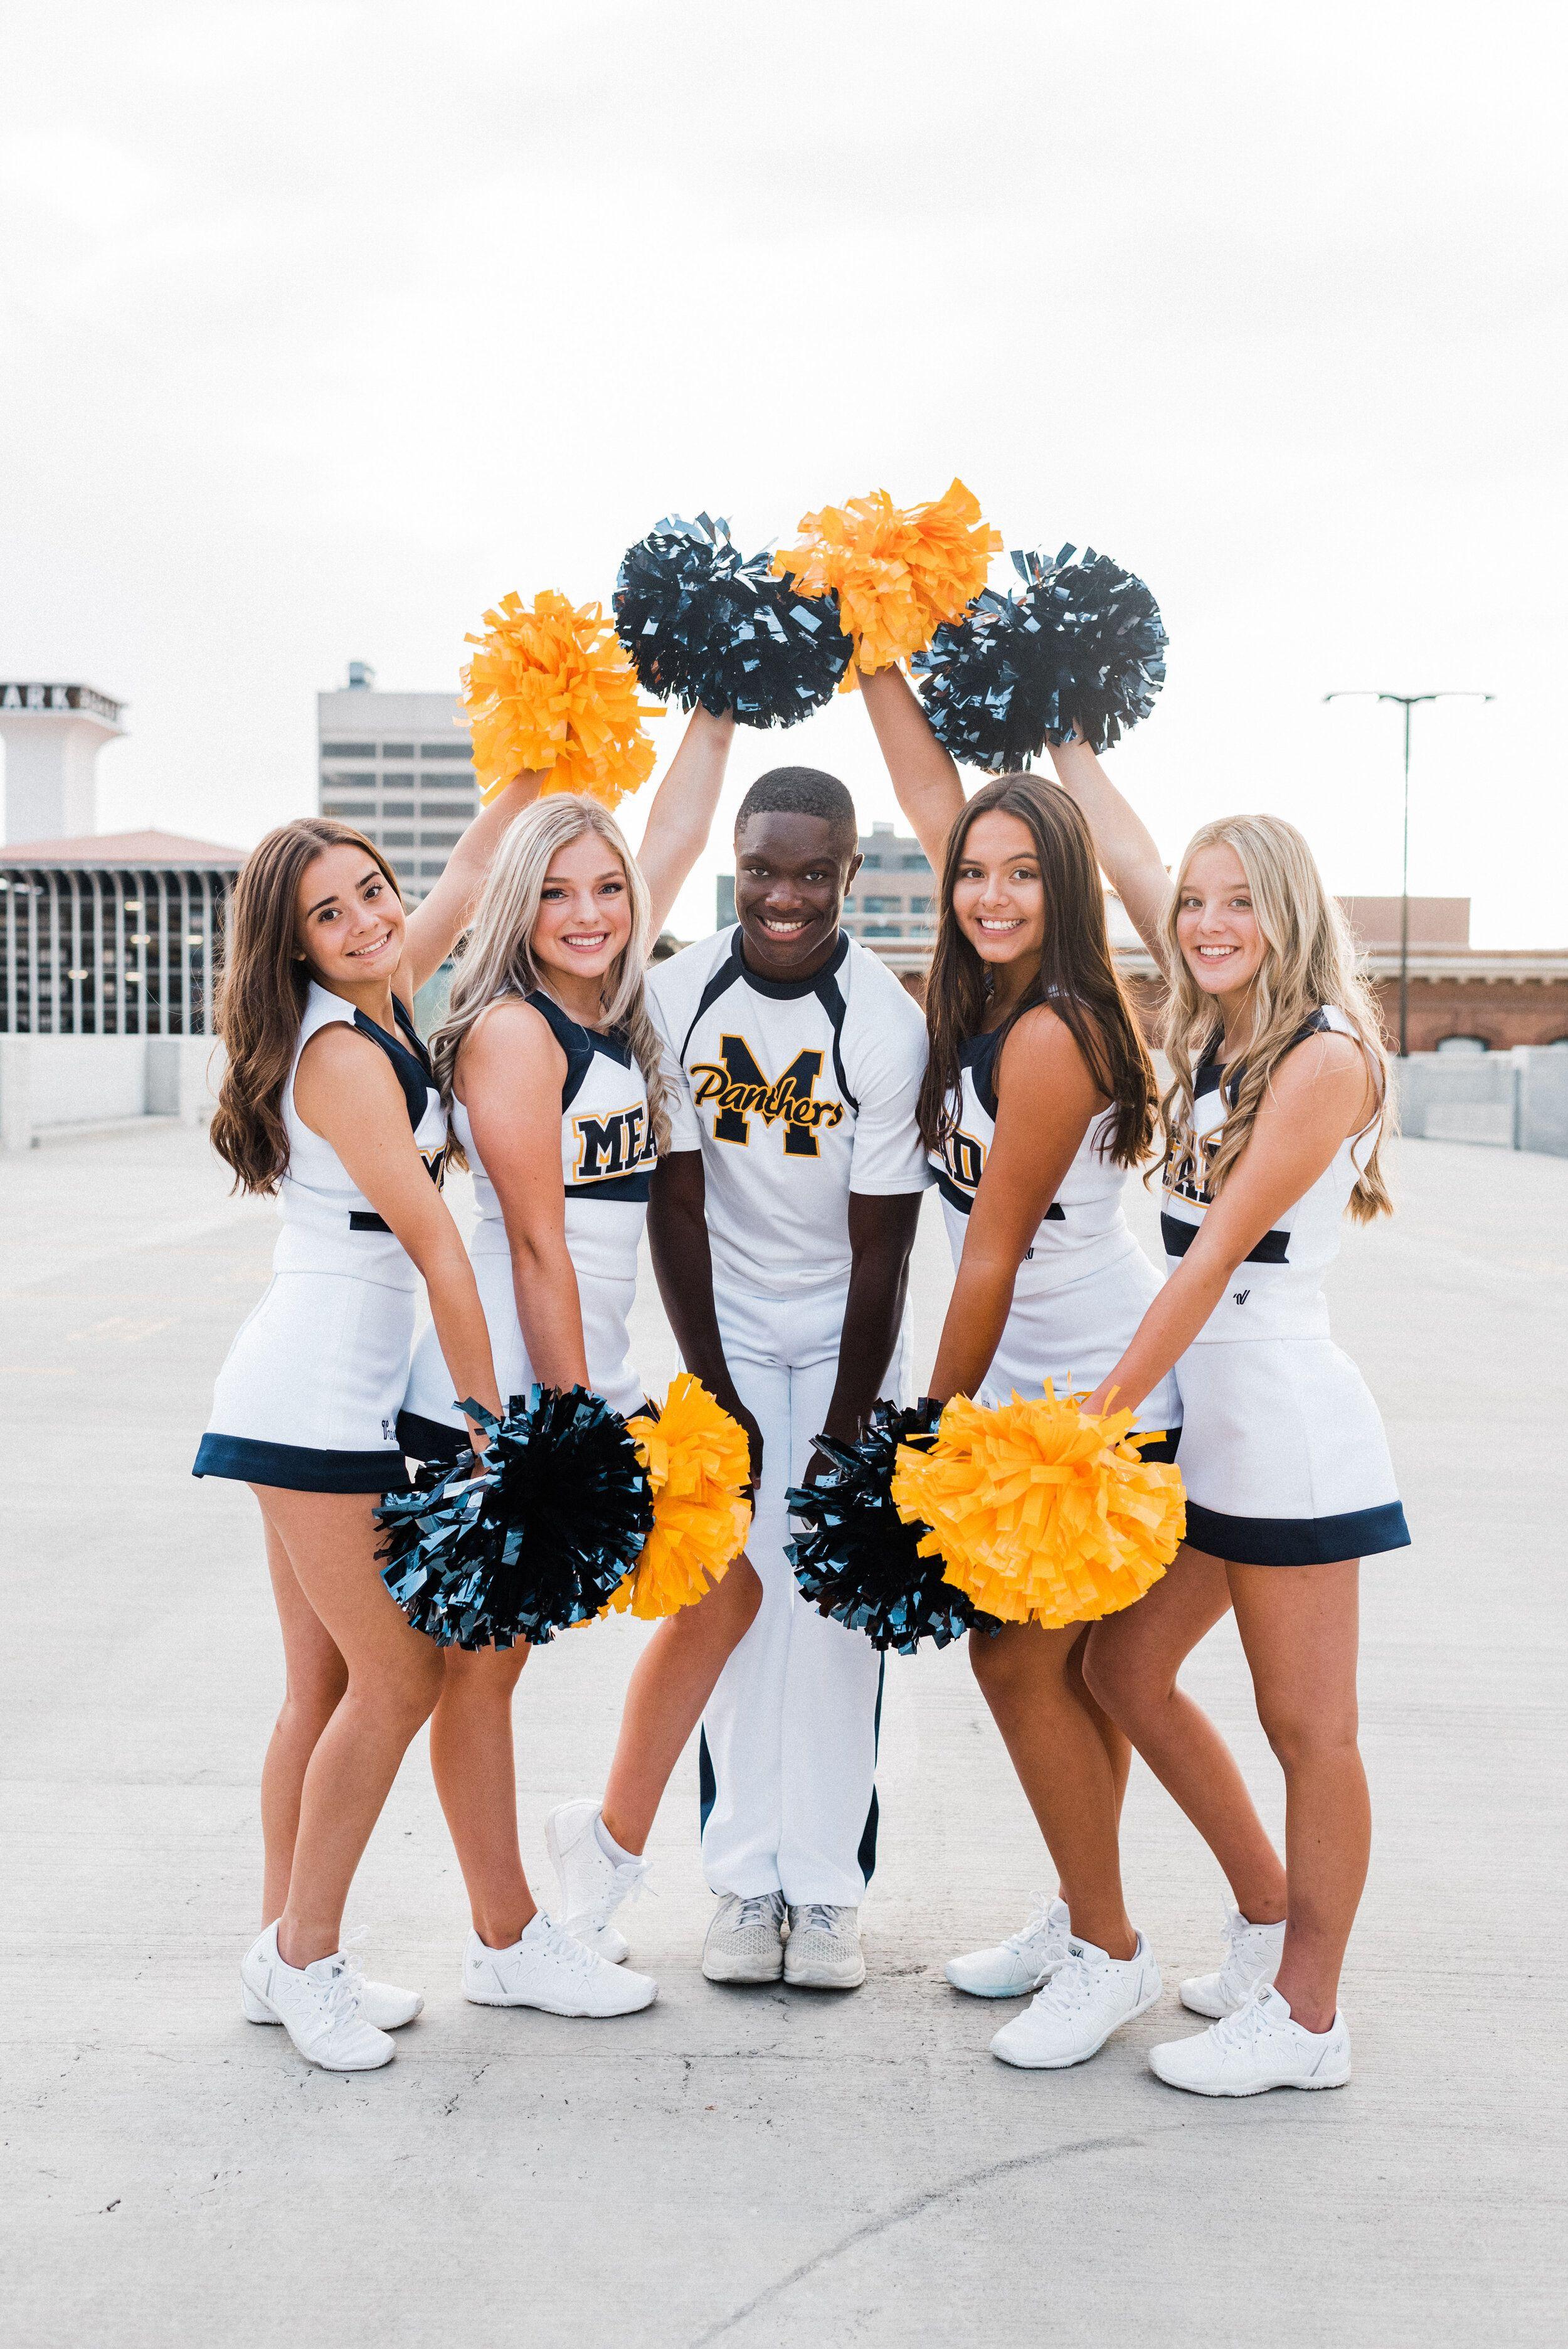 Halloween High 2020 Spokane Wa Mead High School Cheer Team, Spokane, WA in 2020 | High school